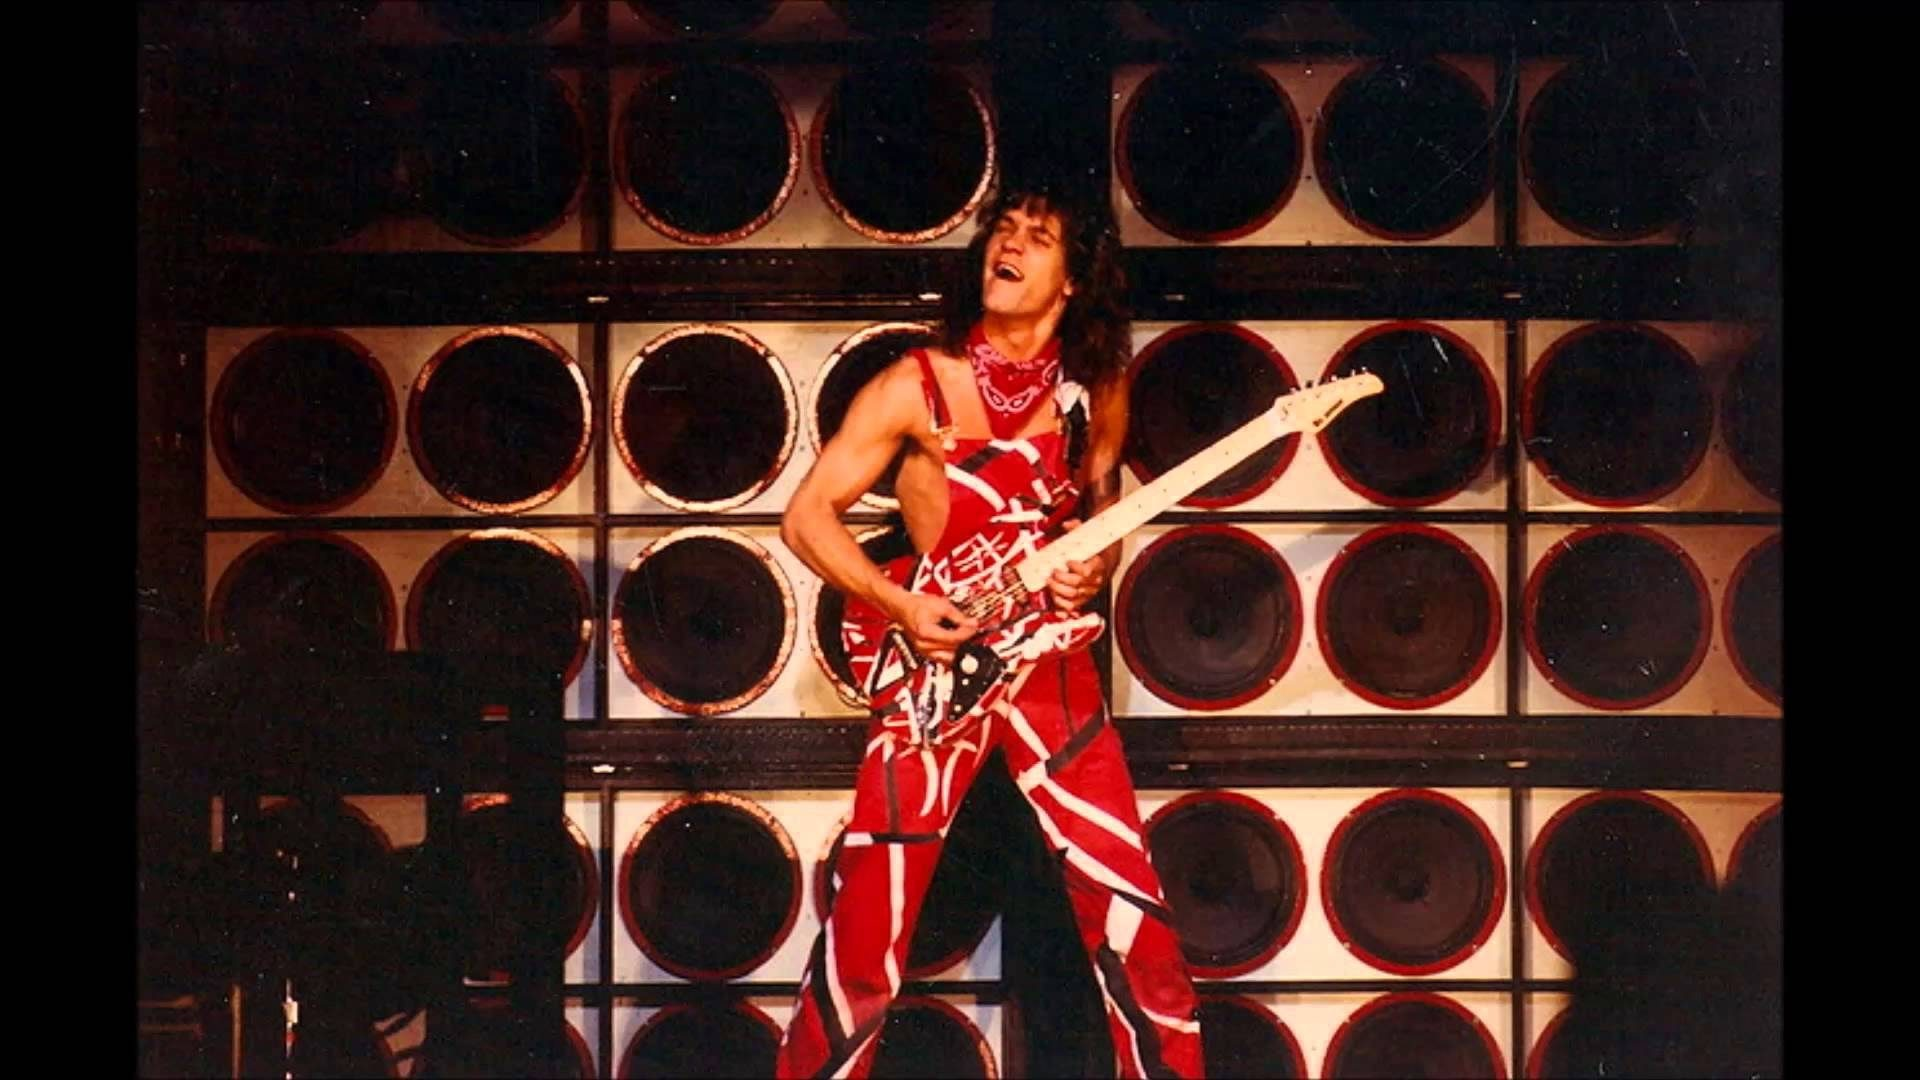 Eddie Van Halen Wallpaper Wallpapertag